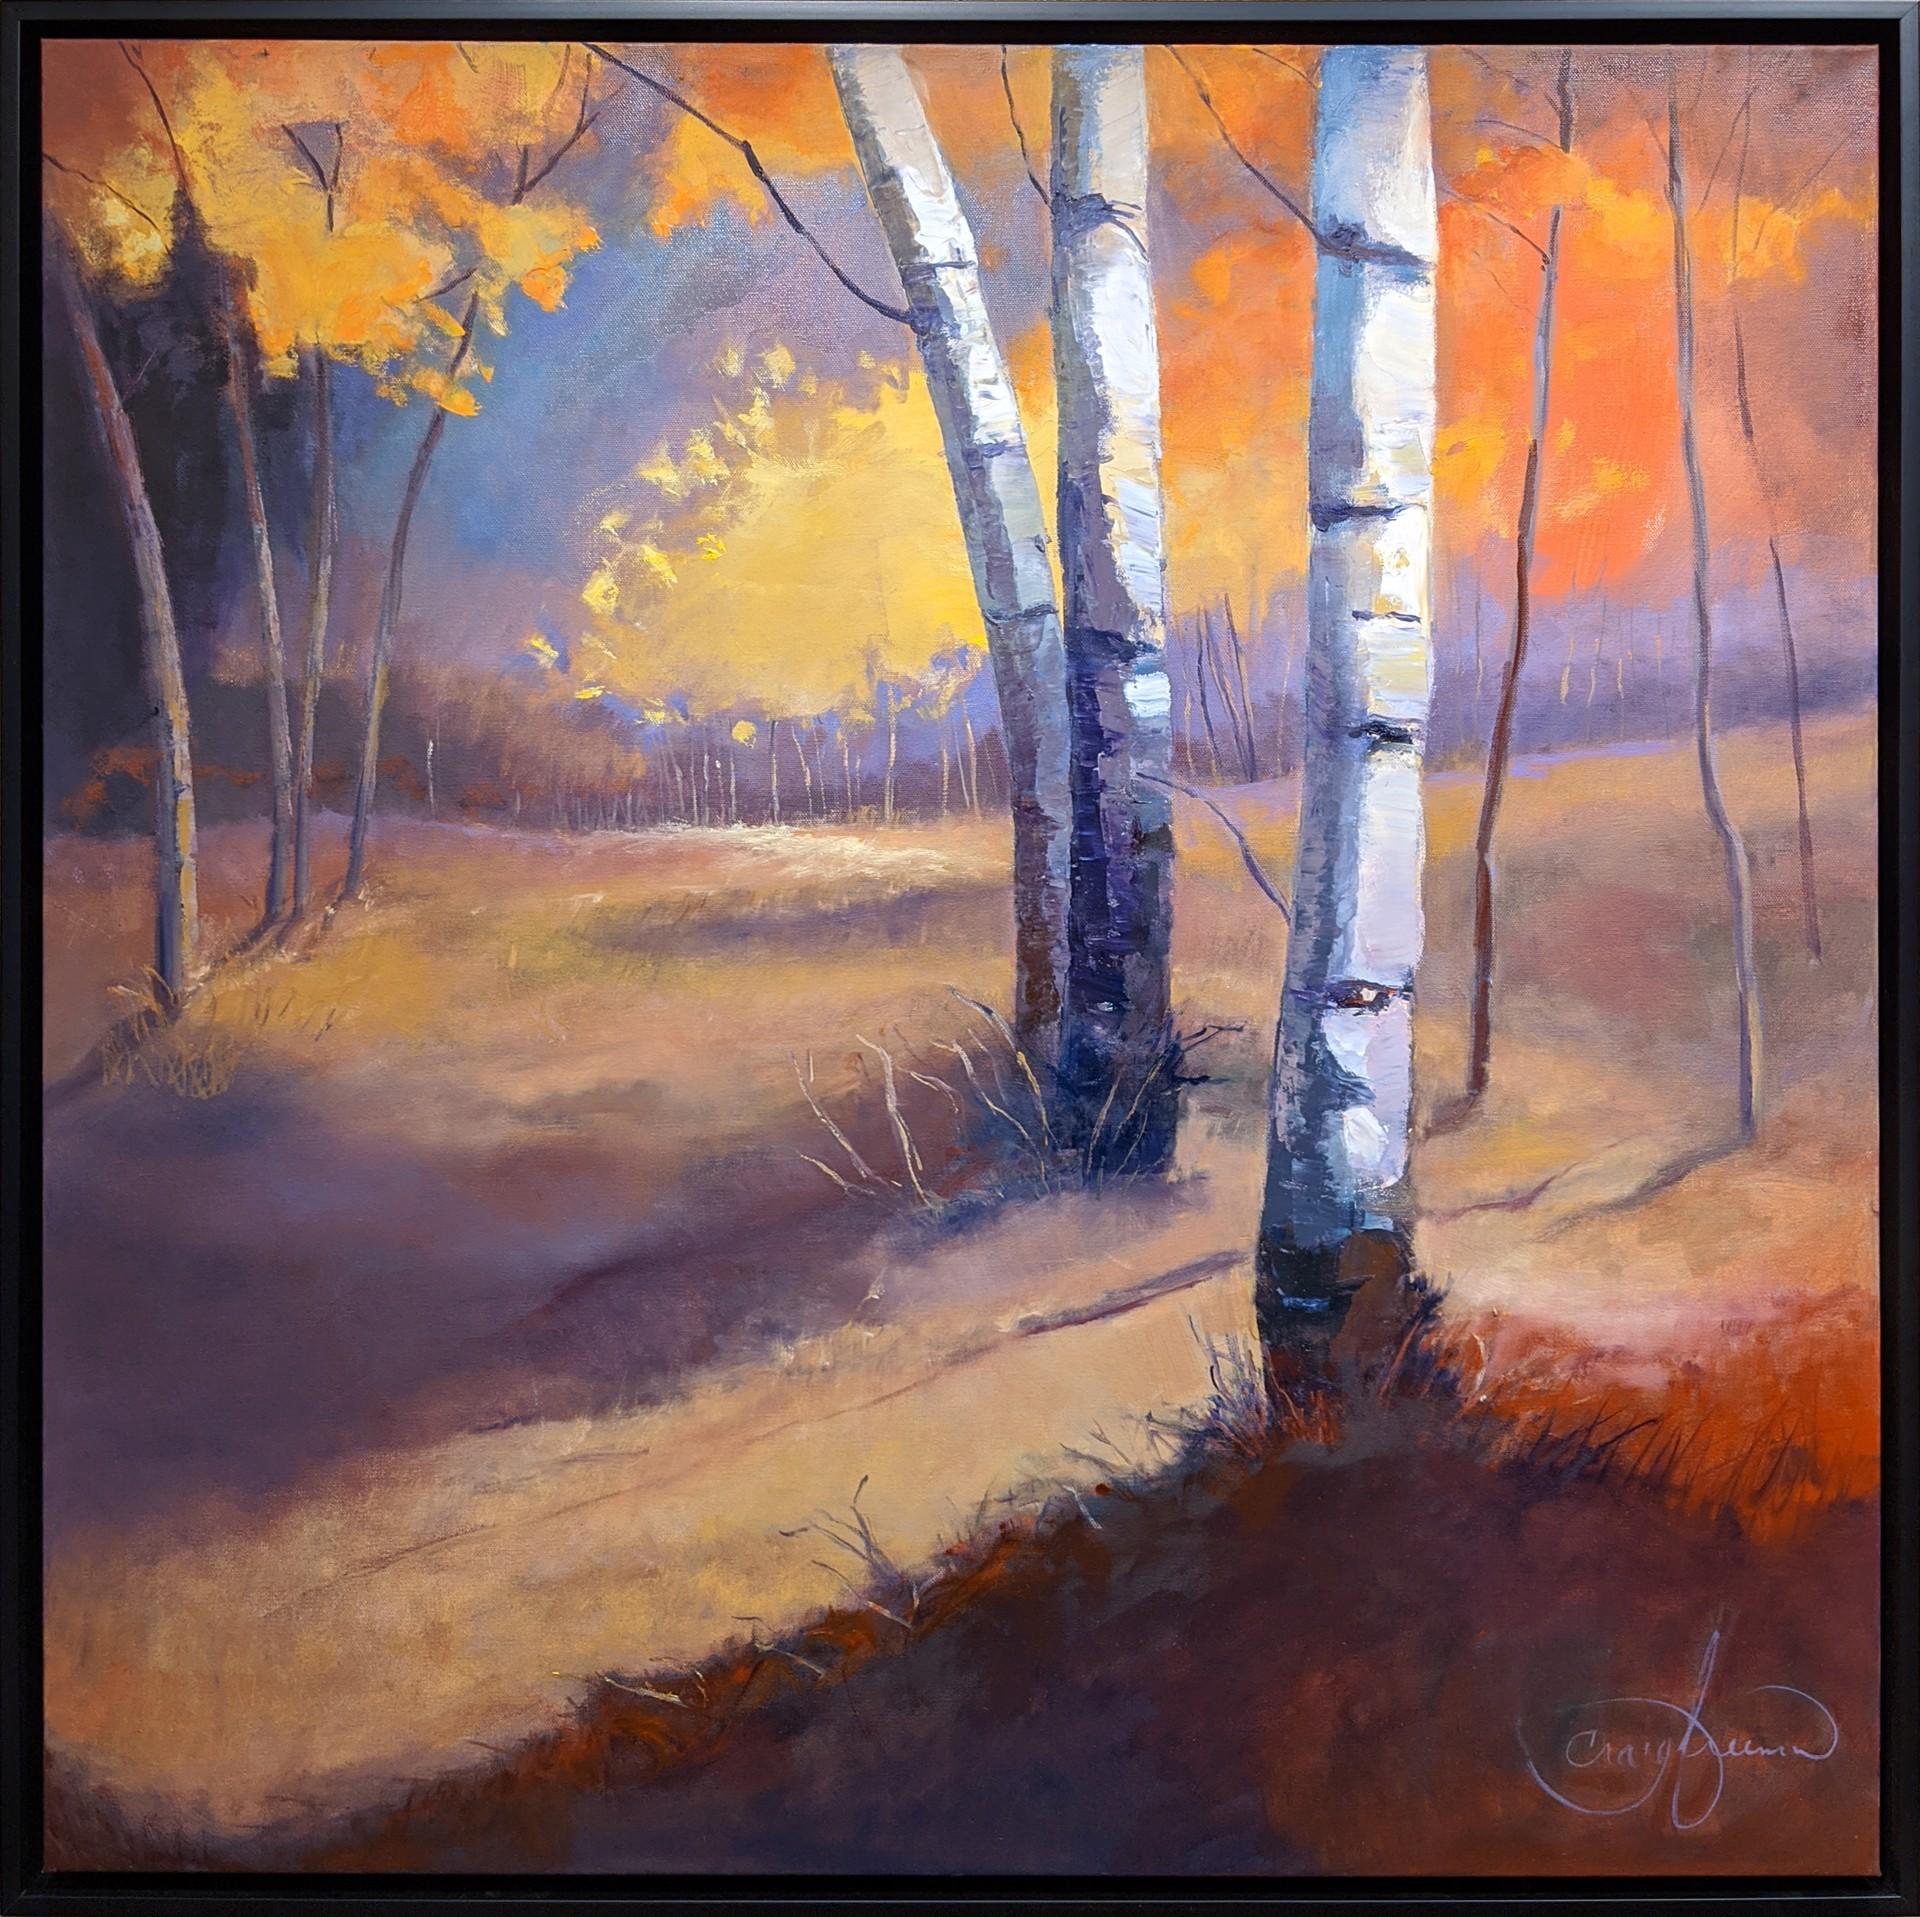 Aspen Meadow by Craig Freeman